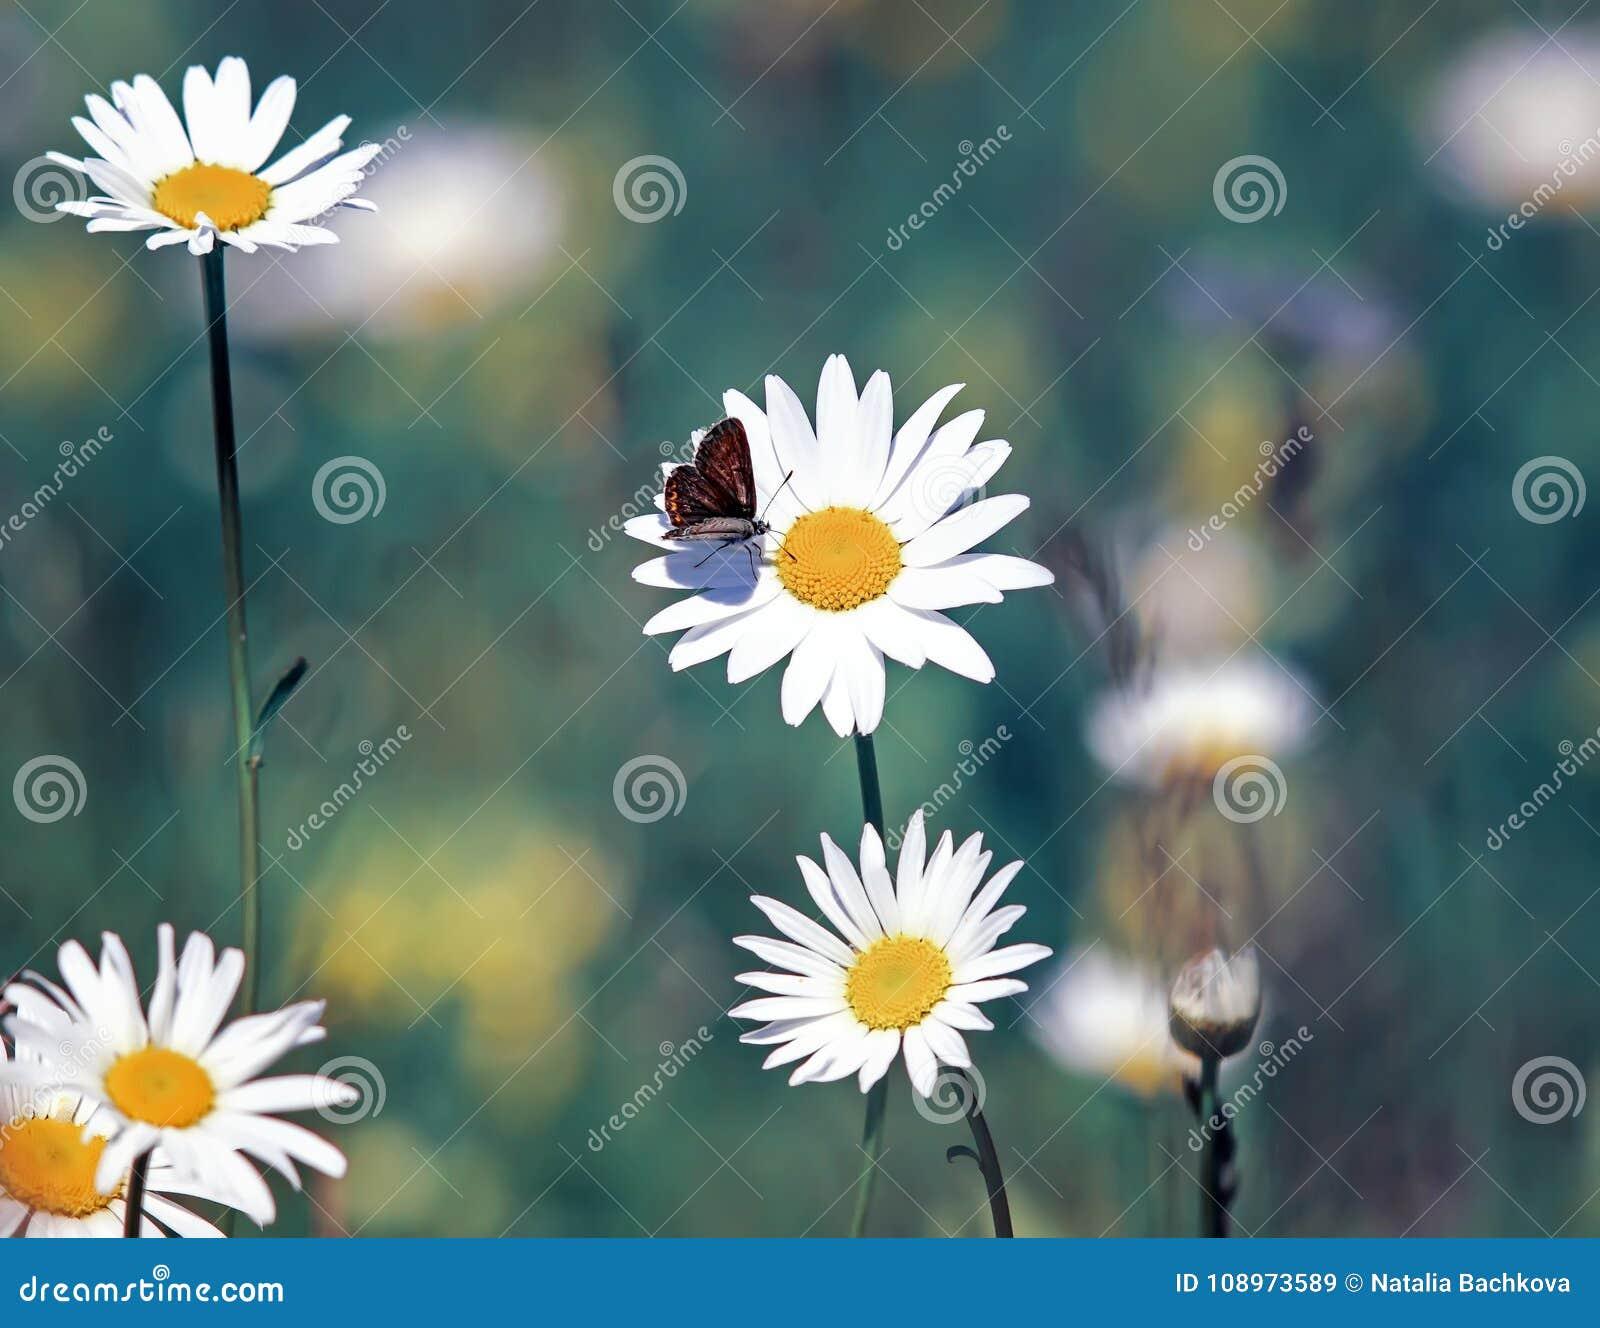 Little butterfly sitting on a daisy flower on a summer stock image little butterfly sitting on a daisy flower on a summer izmirmasajfo